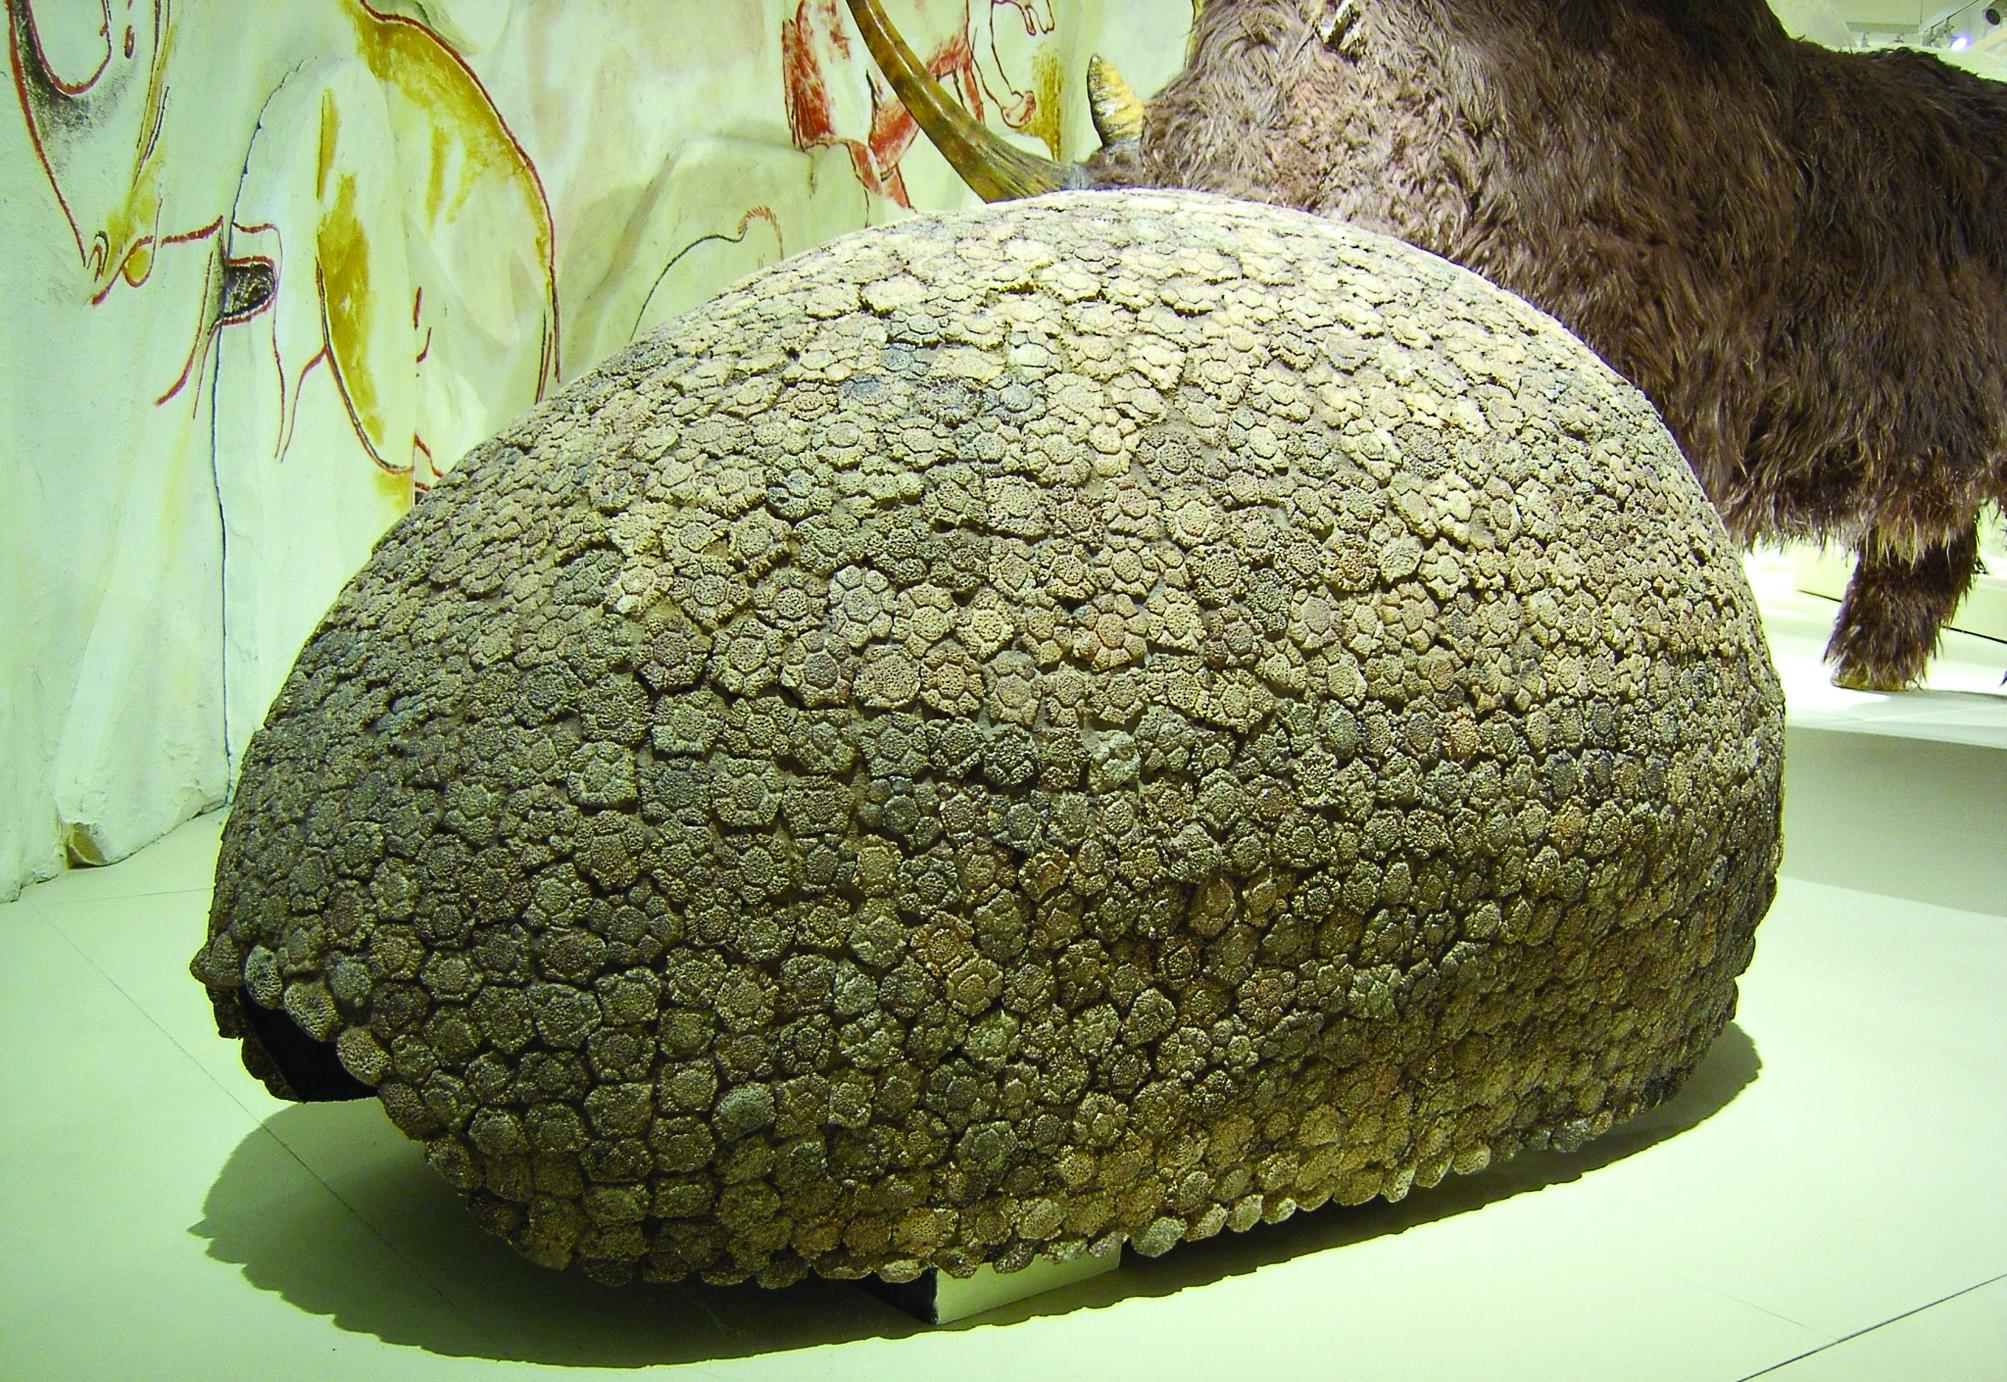 glyptodonpancel_jegkorszak_kiallitas2008.jpg